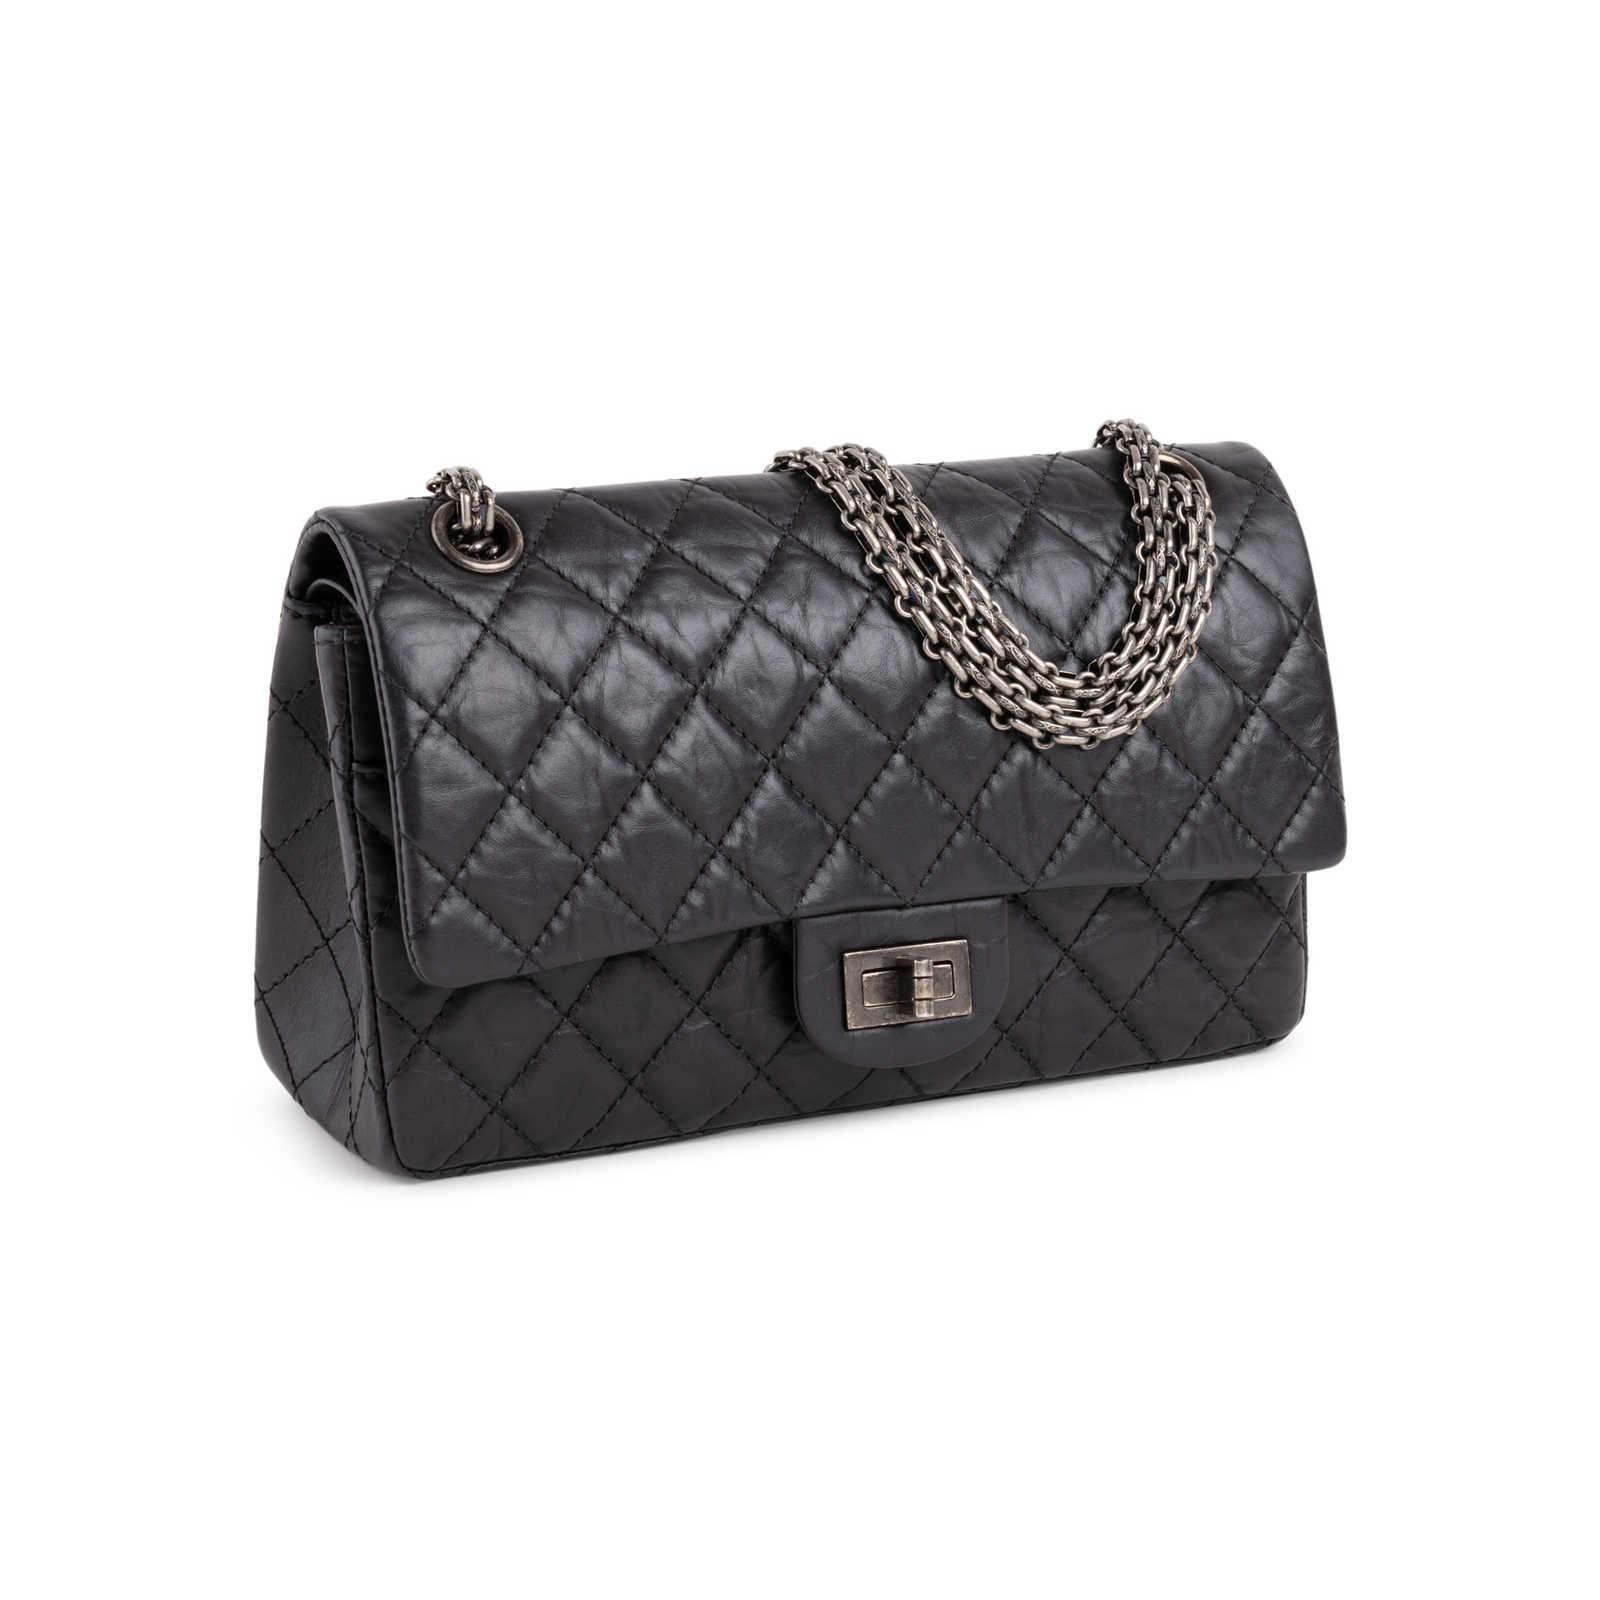 9827bfdbf ... Authentic Second Hand Chanel Reissue 2.55 Handbag (PSS-680-00011) -  Thumbnail ...